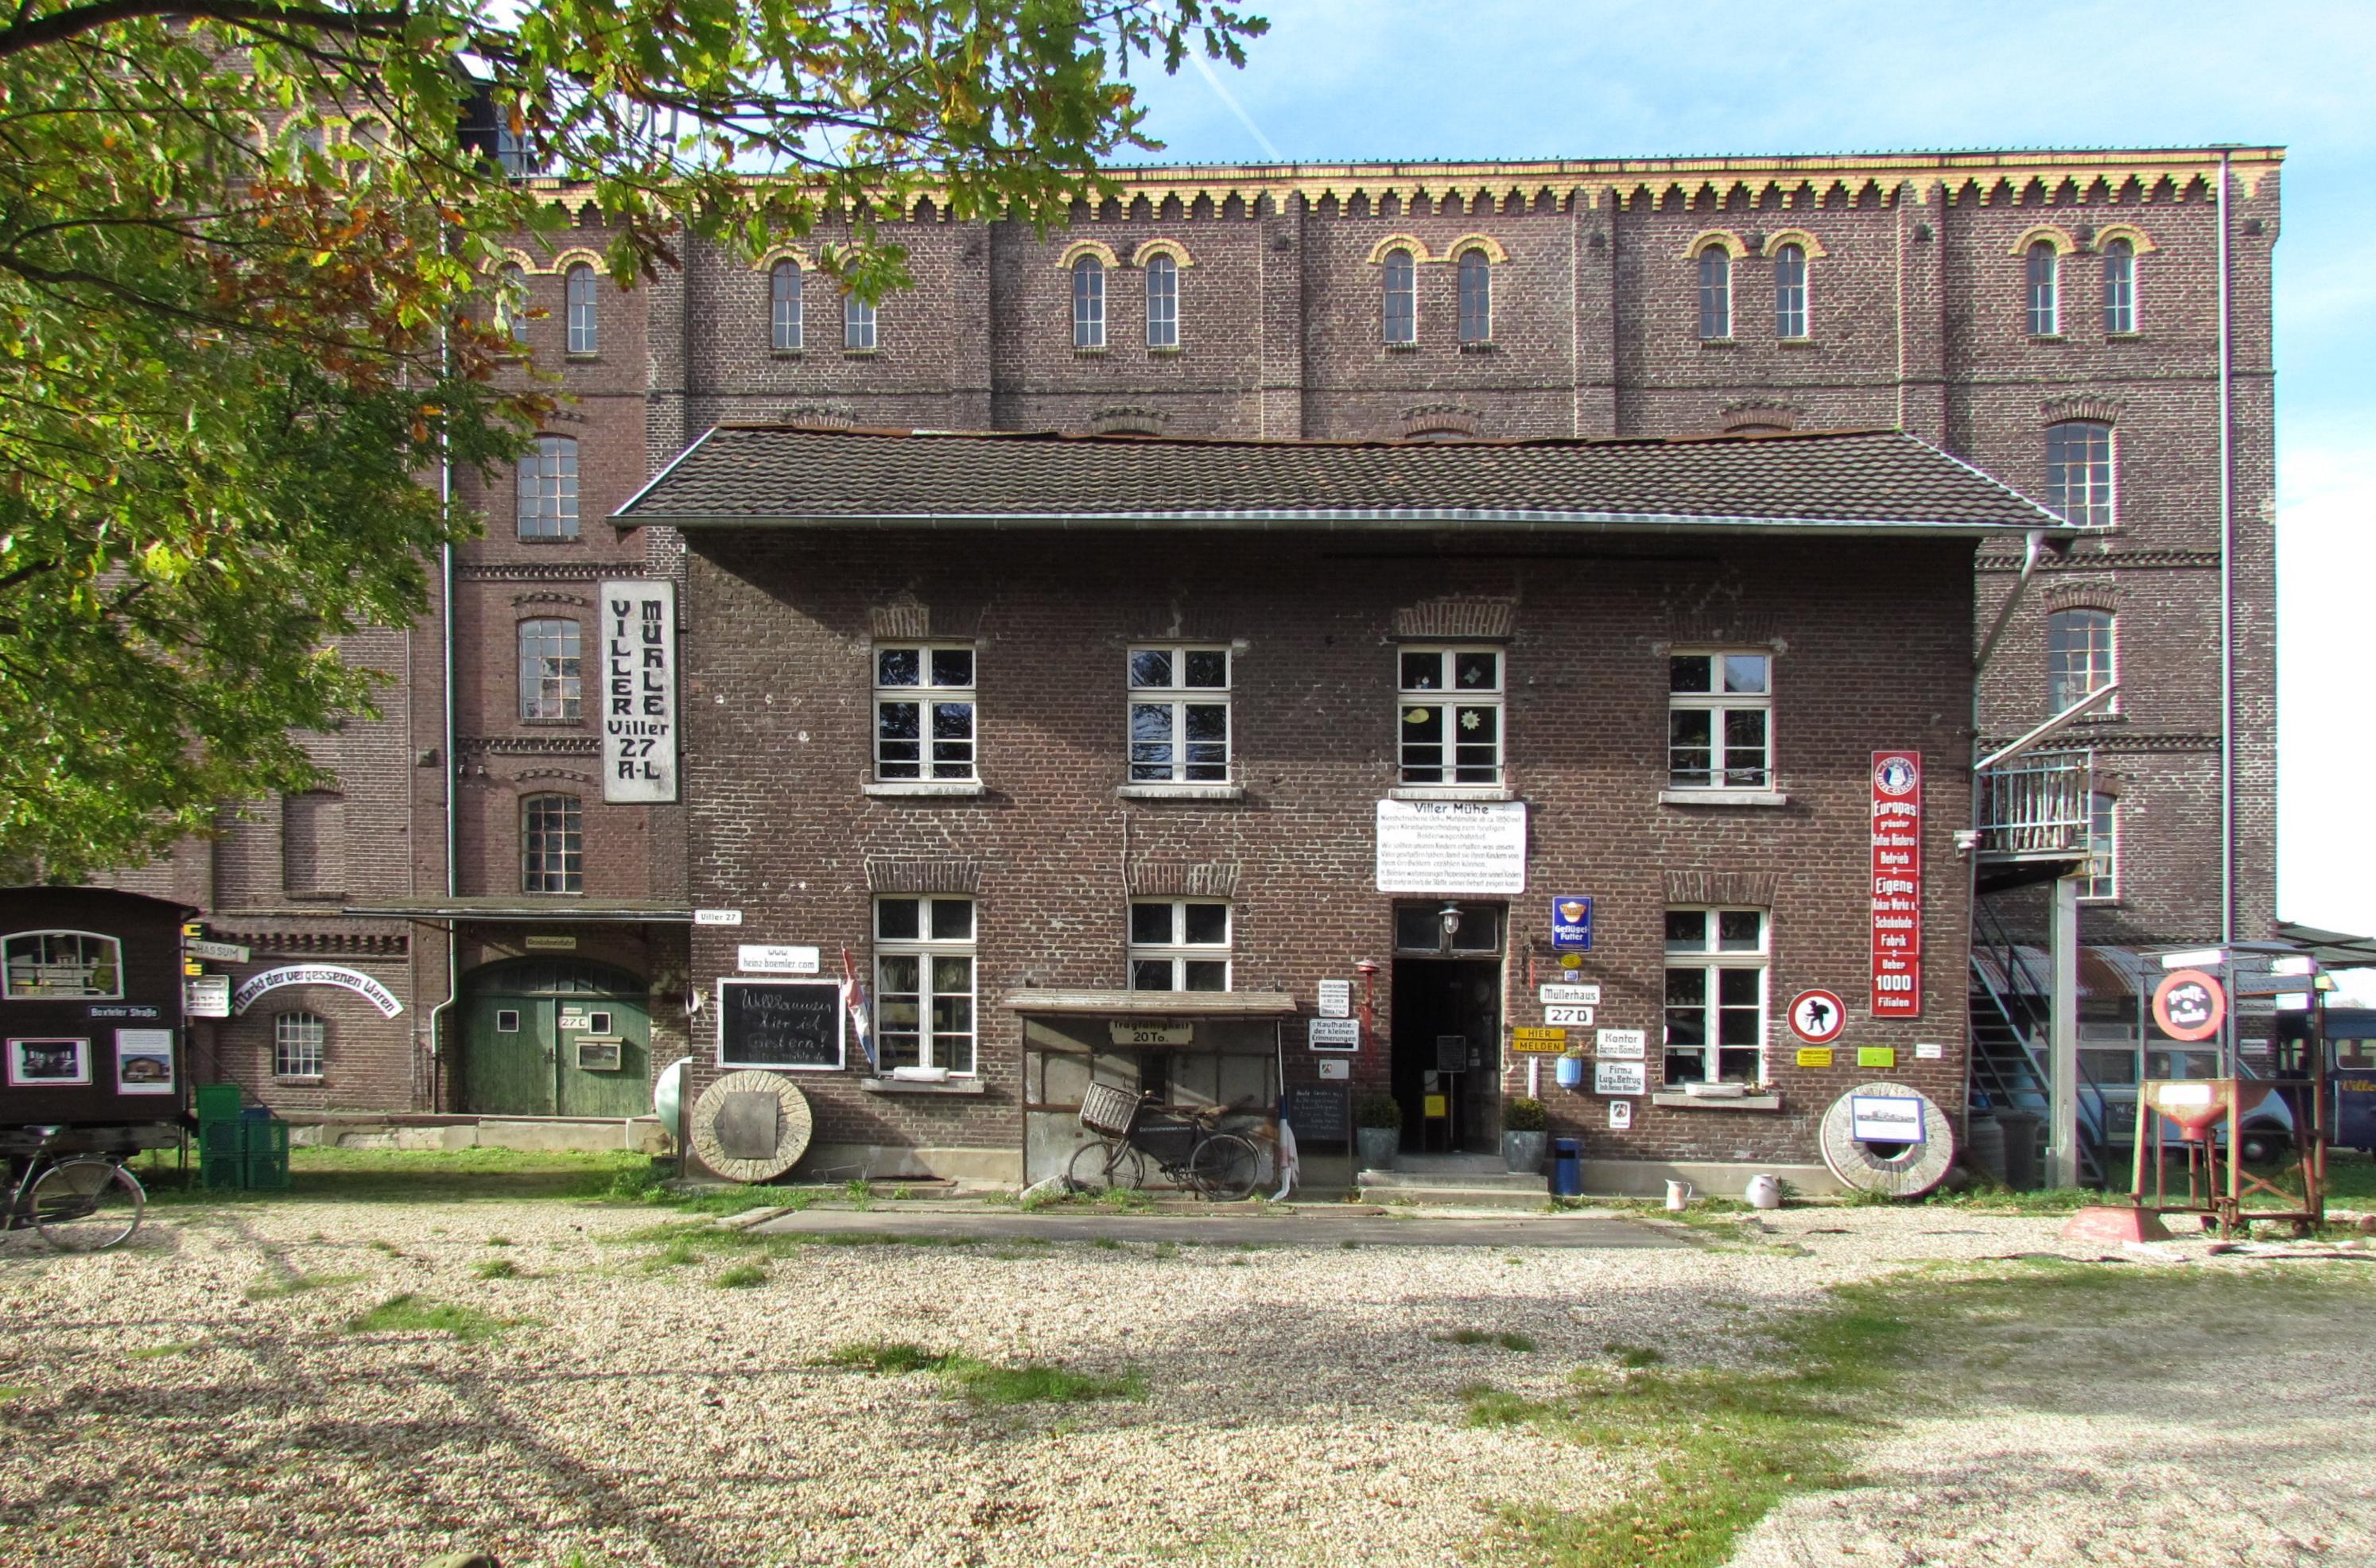 File:461 Viller Mühle, Haus 2, Goch-Hommersum.jpg - Wikimedia Commons